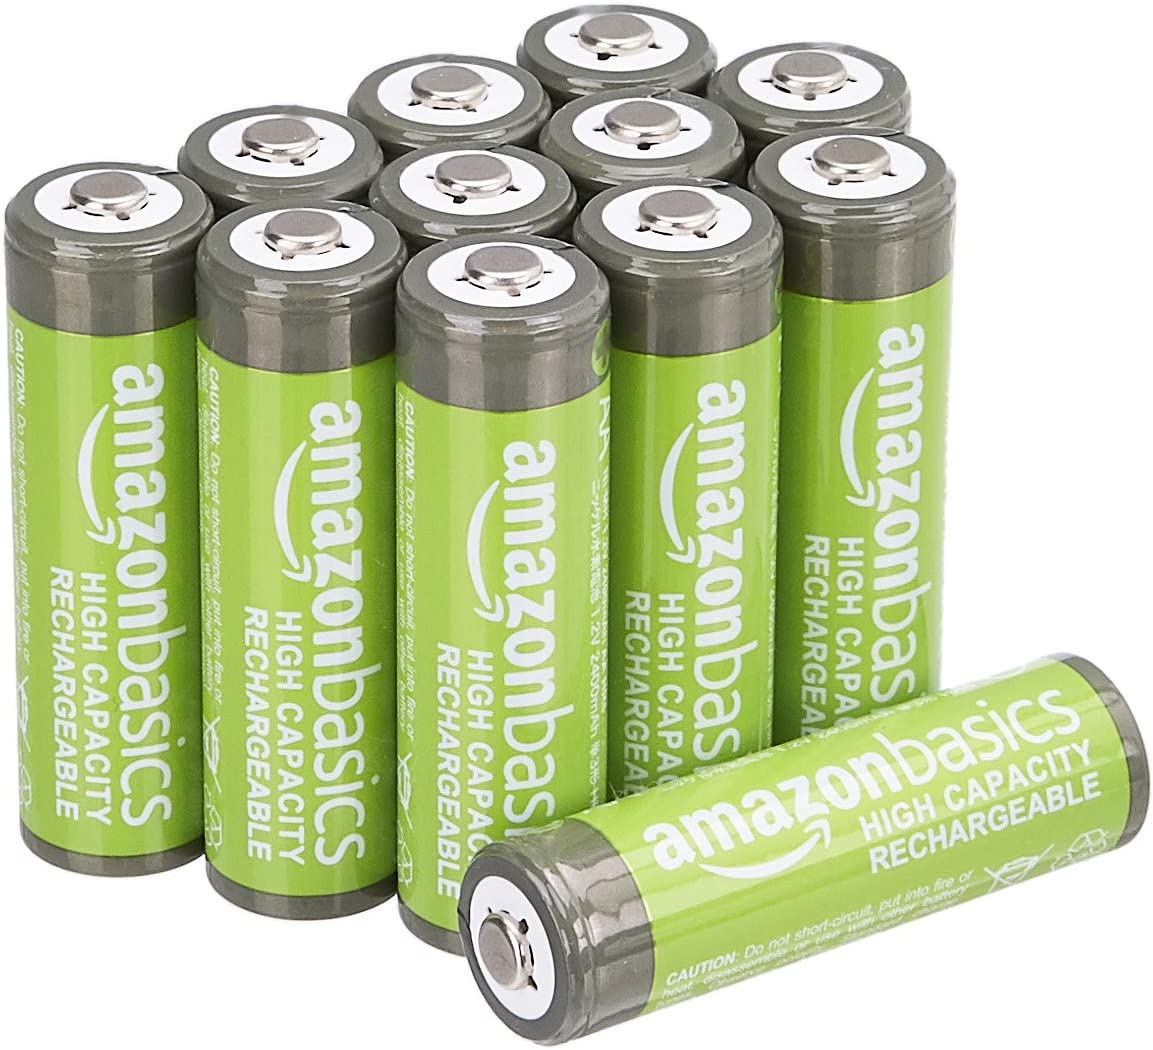 AmazonBasics - Pilas AA recargables de alta capacidad, 2400 mAh (paquete de 12), precargadas